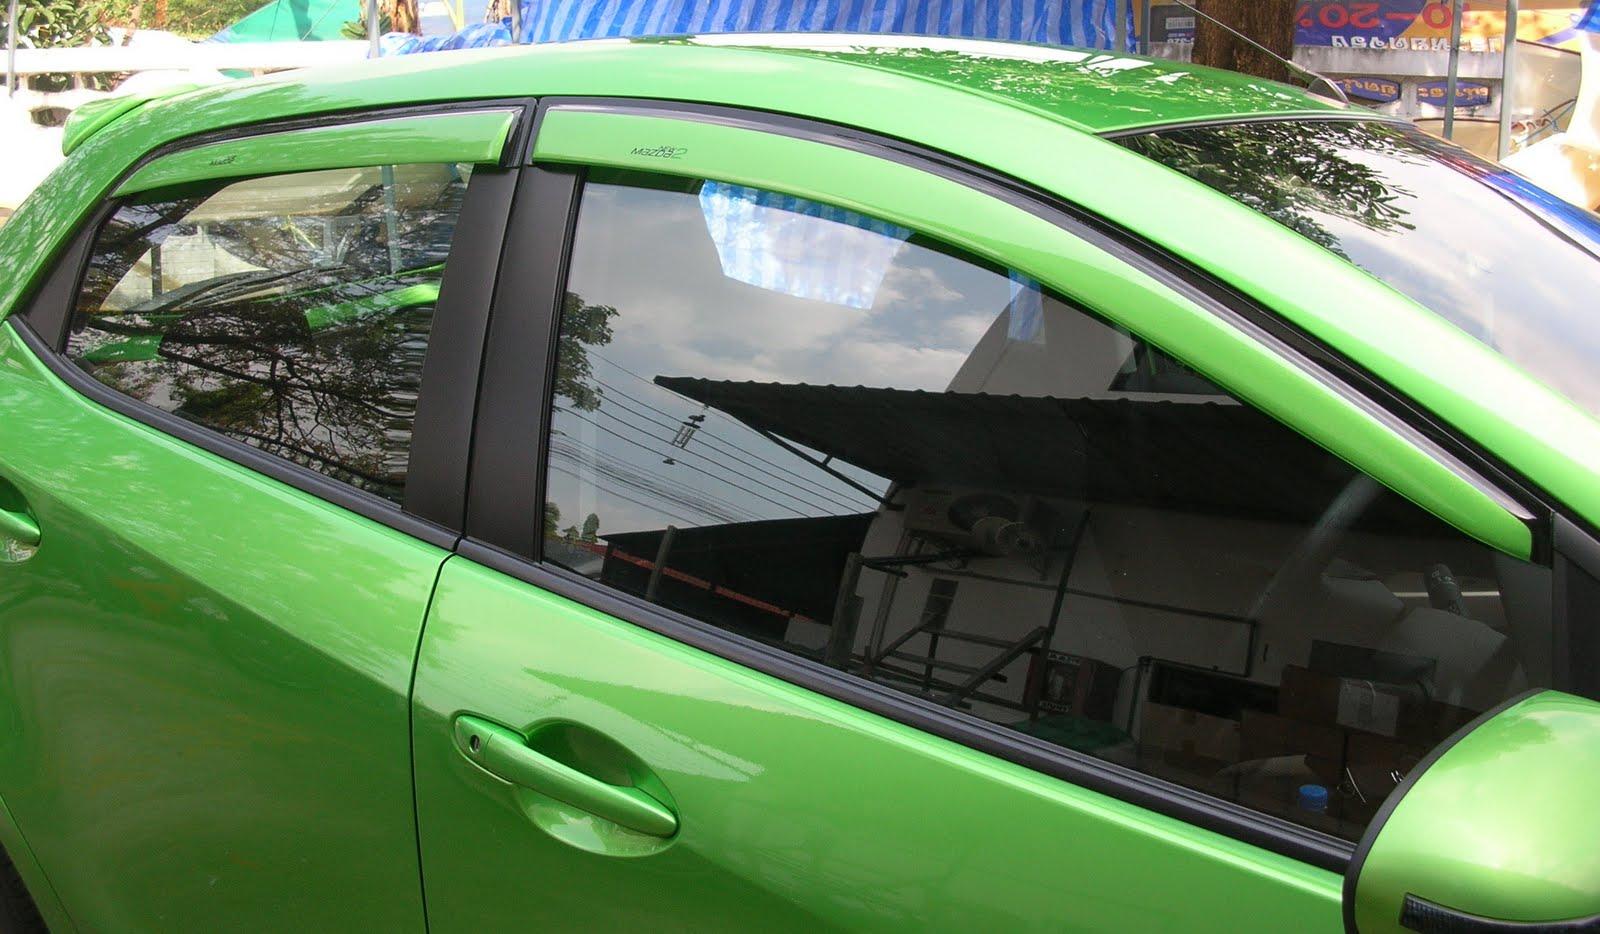 http://4.bp.blogspot.com/_3GbqhjUQtrE/TDLeHNoXv1I/AAAAAAAAAQ4/0wXFtWQkoCQ/s1600/Mazda2_WindowVisor%2BPaint.jpg